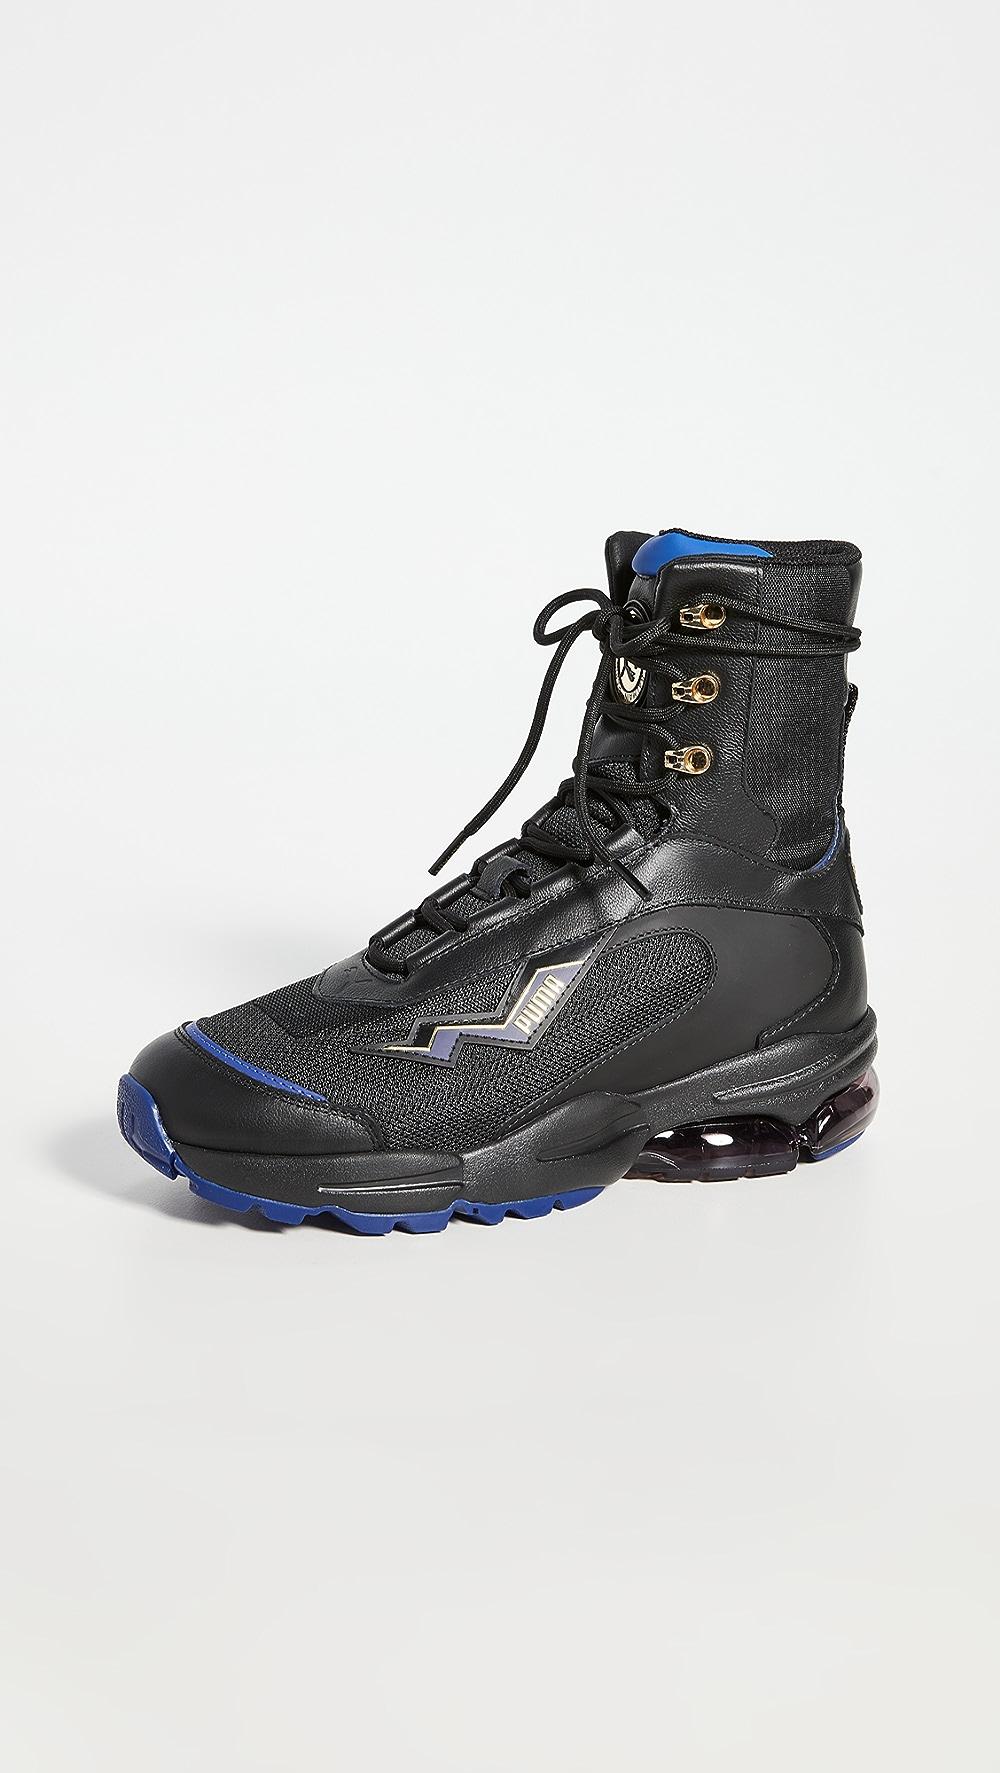 Able Puma - X Balmain Cell Stellar Mid Sneakers Superior Materials